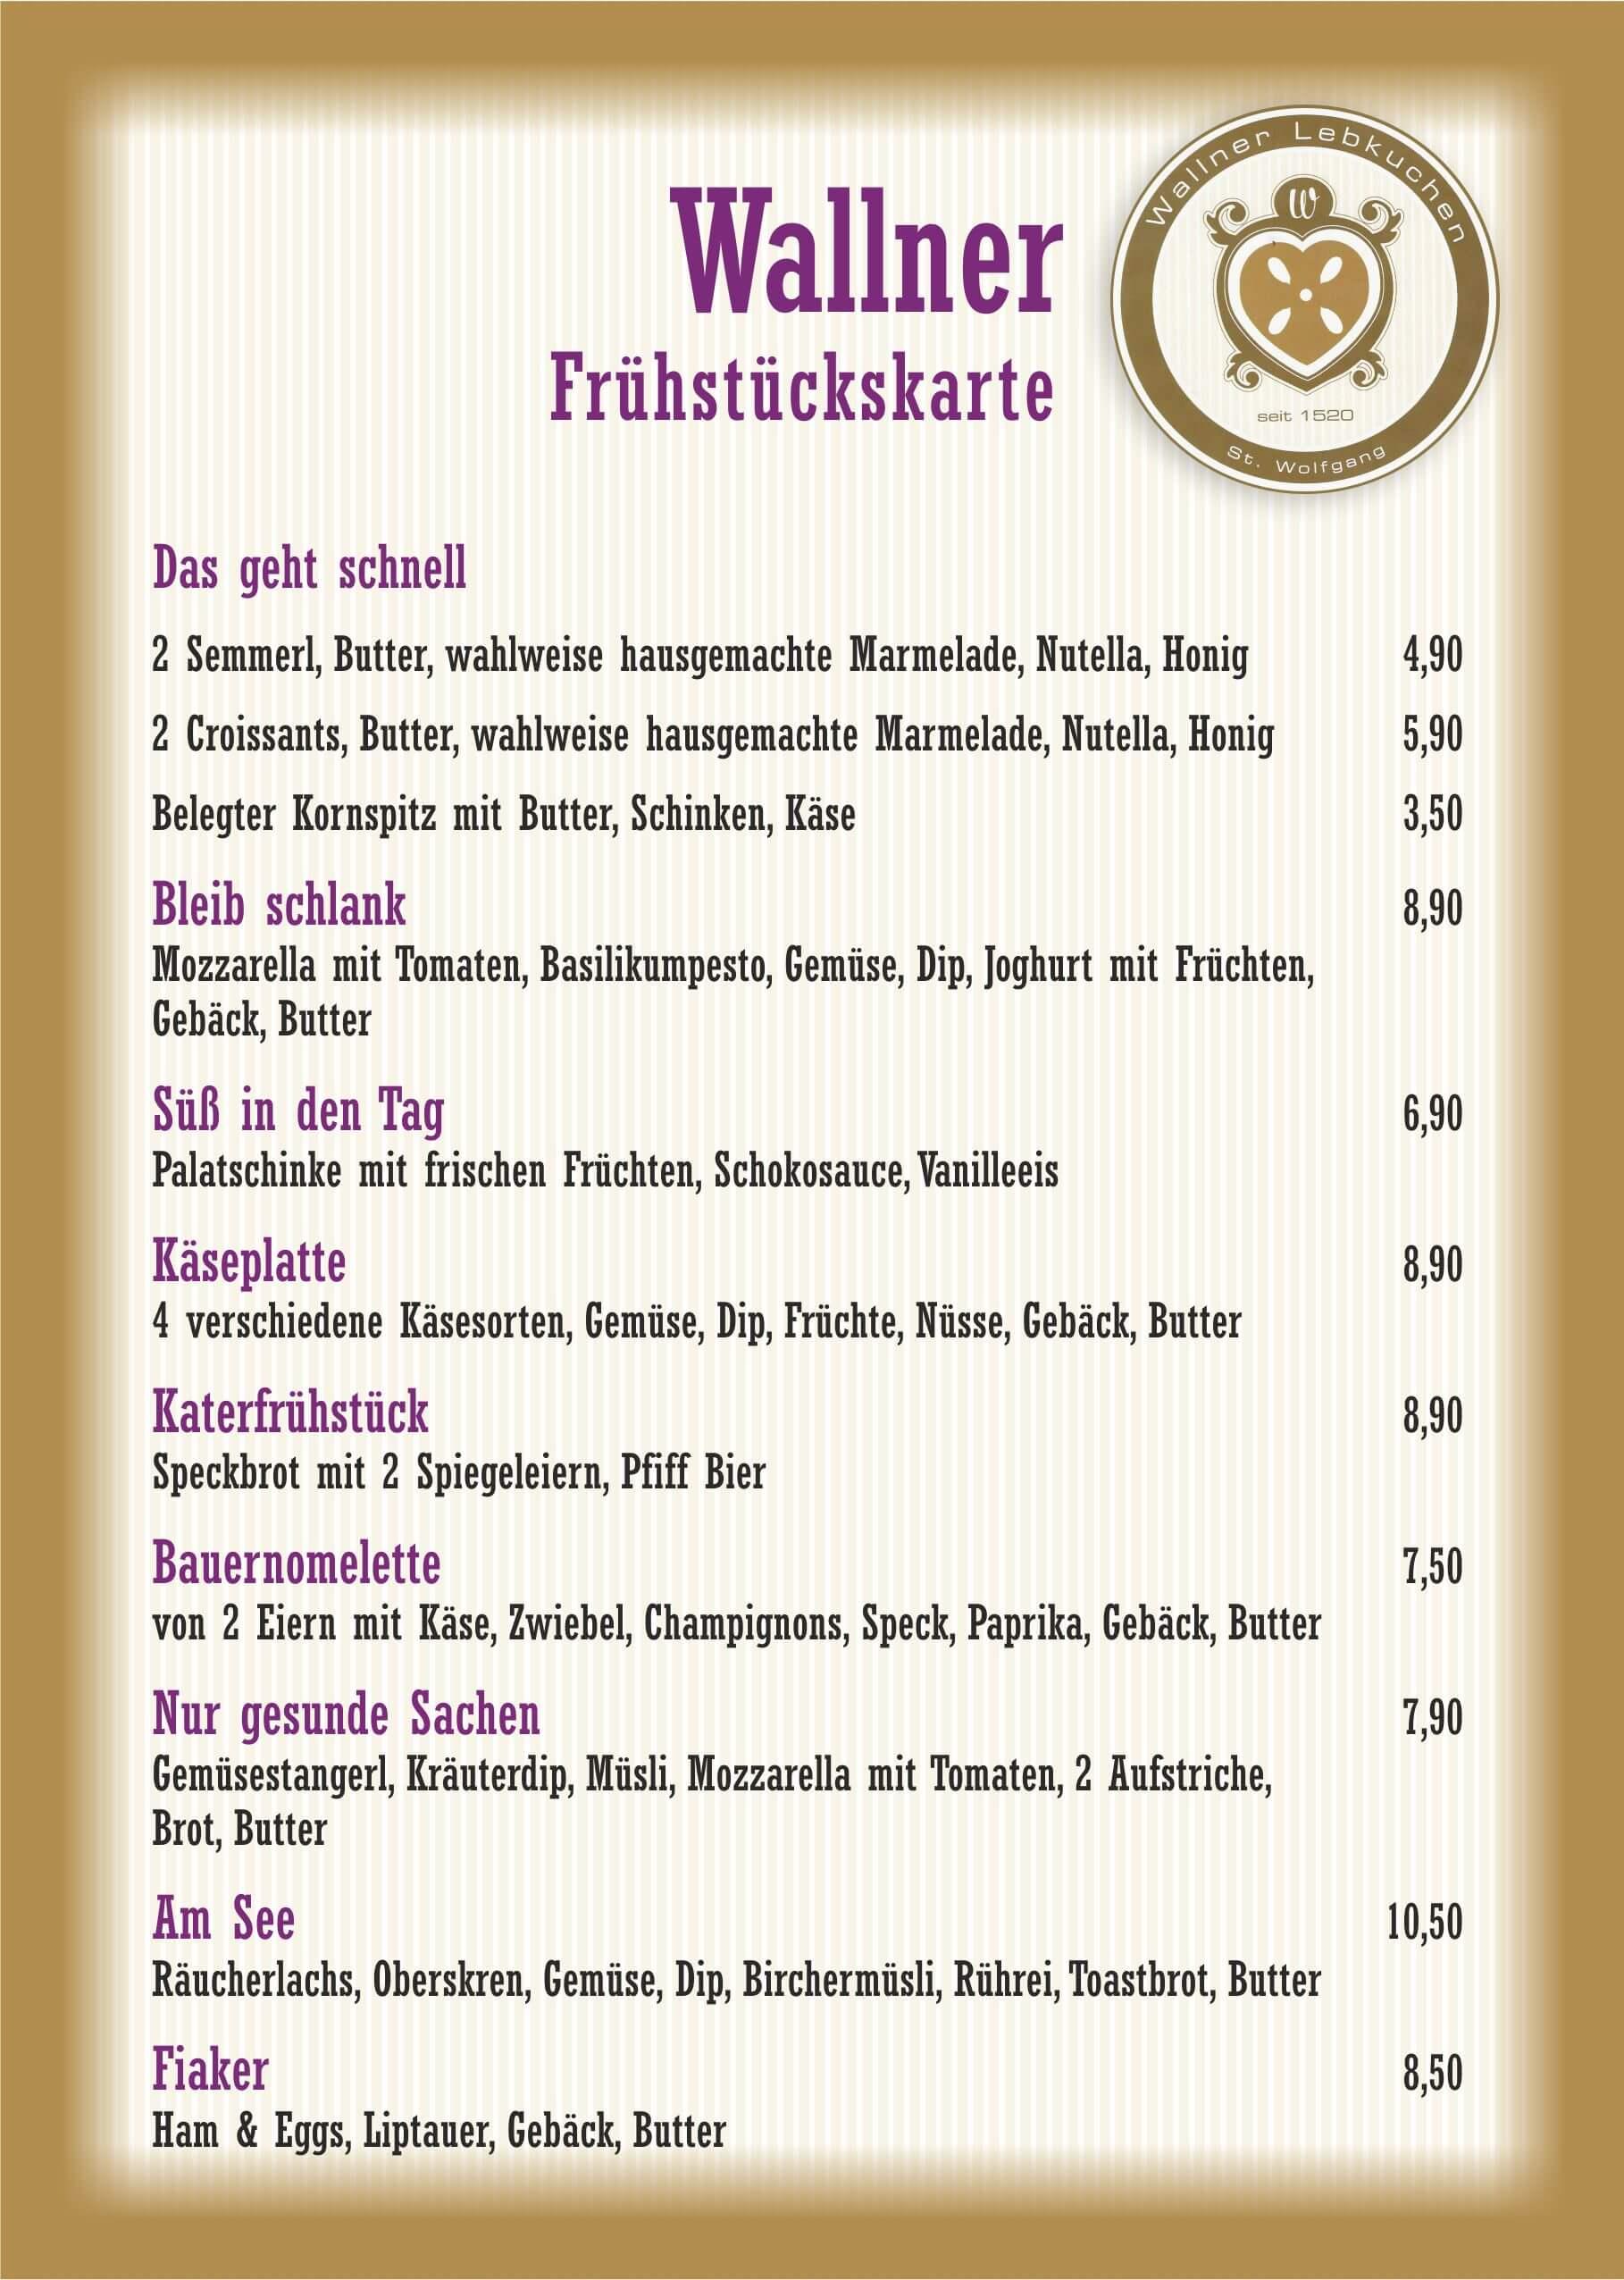 Frühstückskarte, Kaffeehaus Wallner, St.Wolfgang